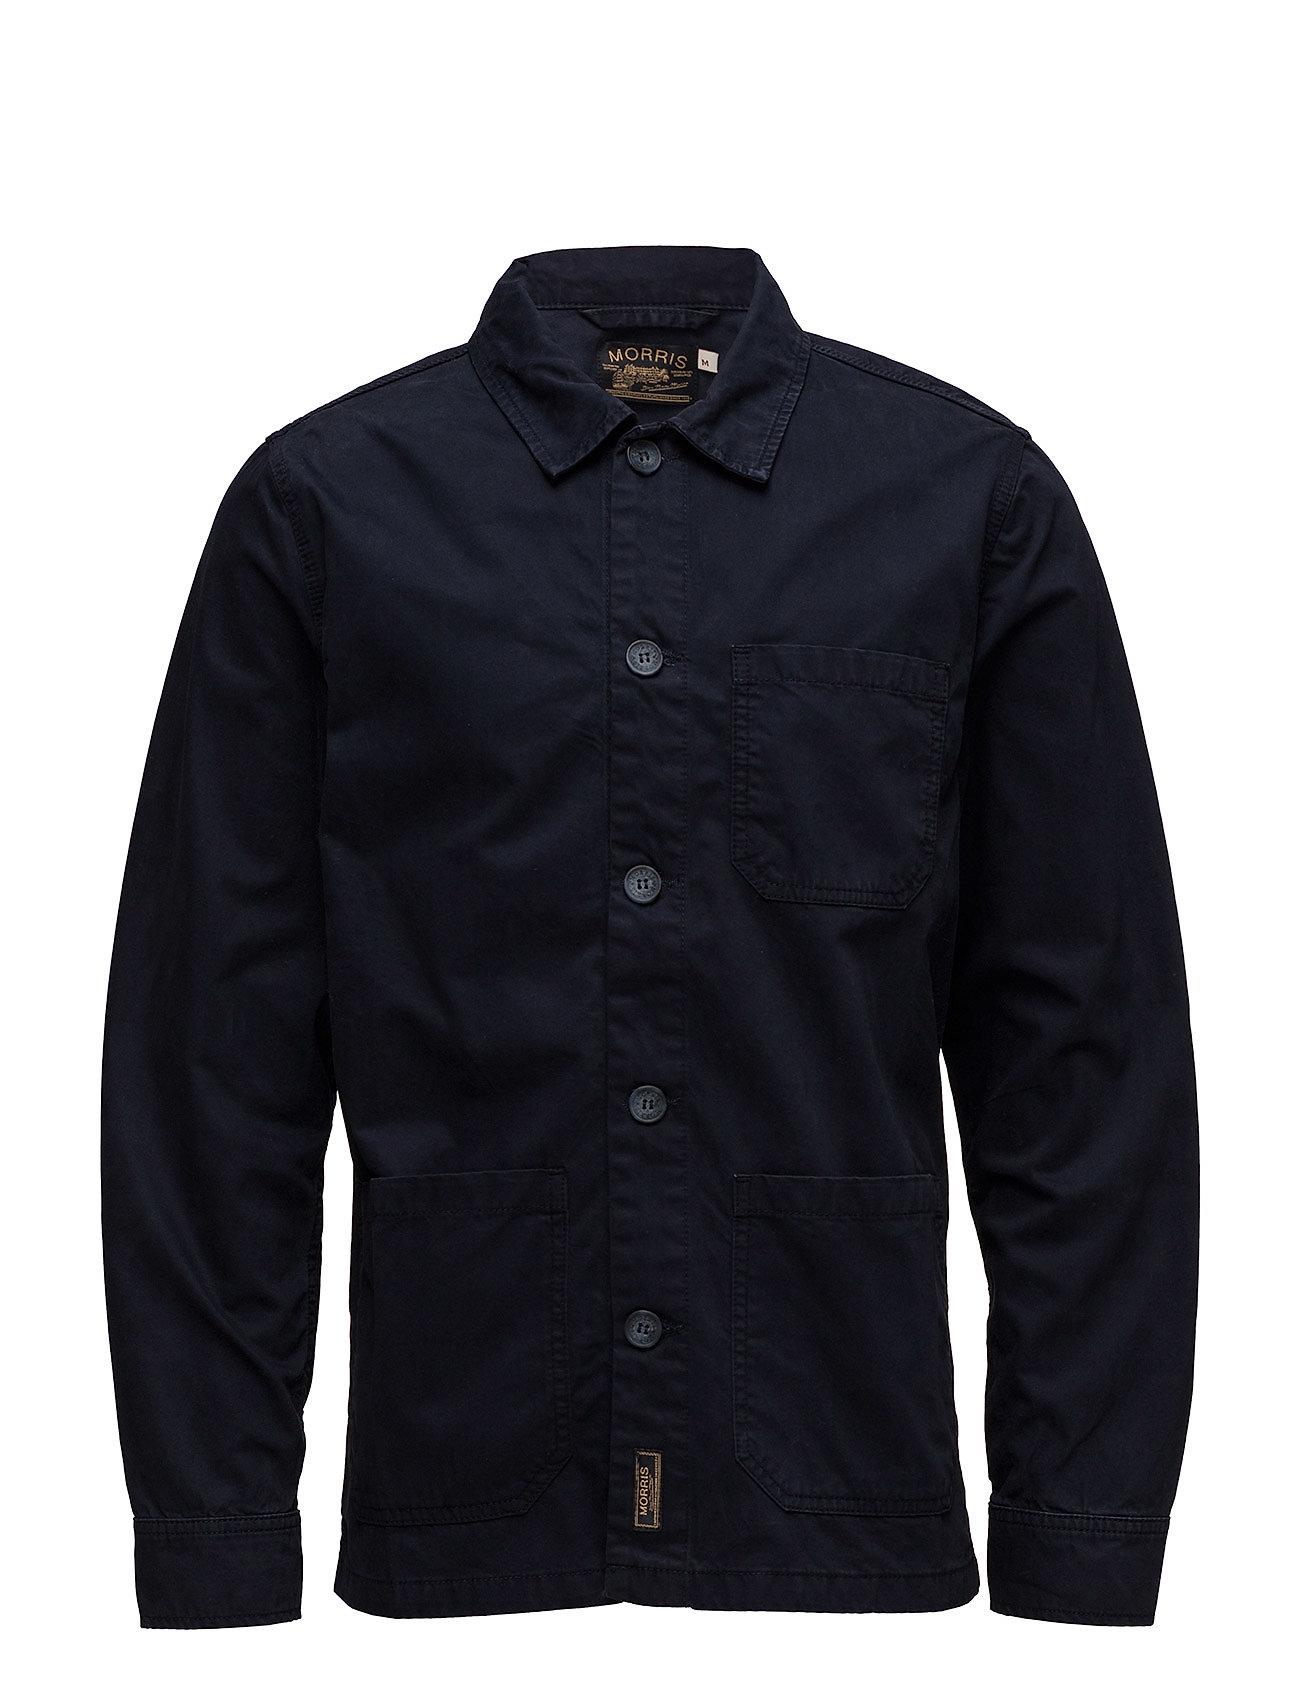 Henri Shirt Jacket - Morris